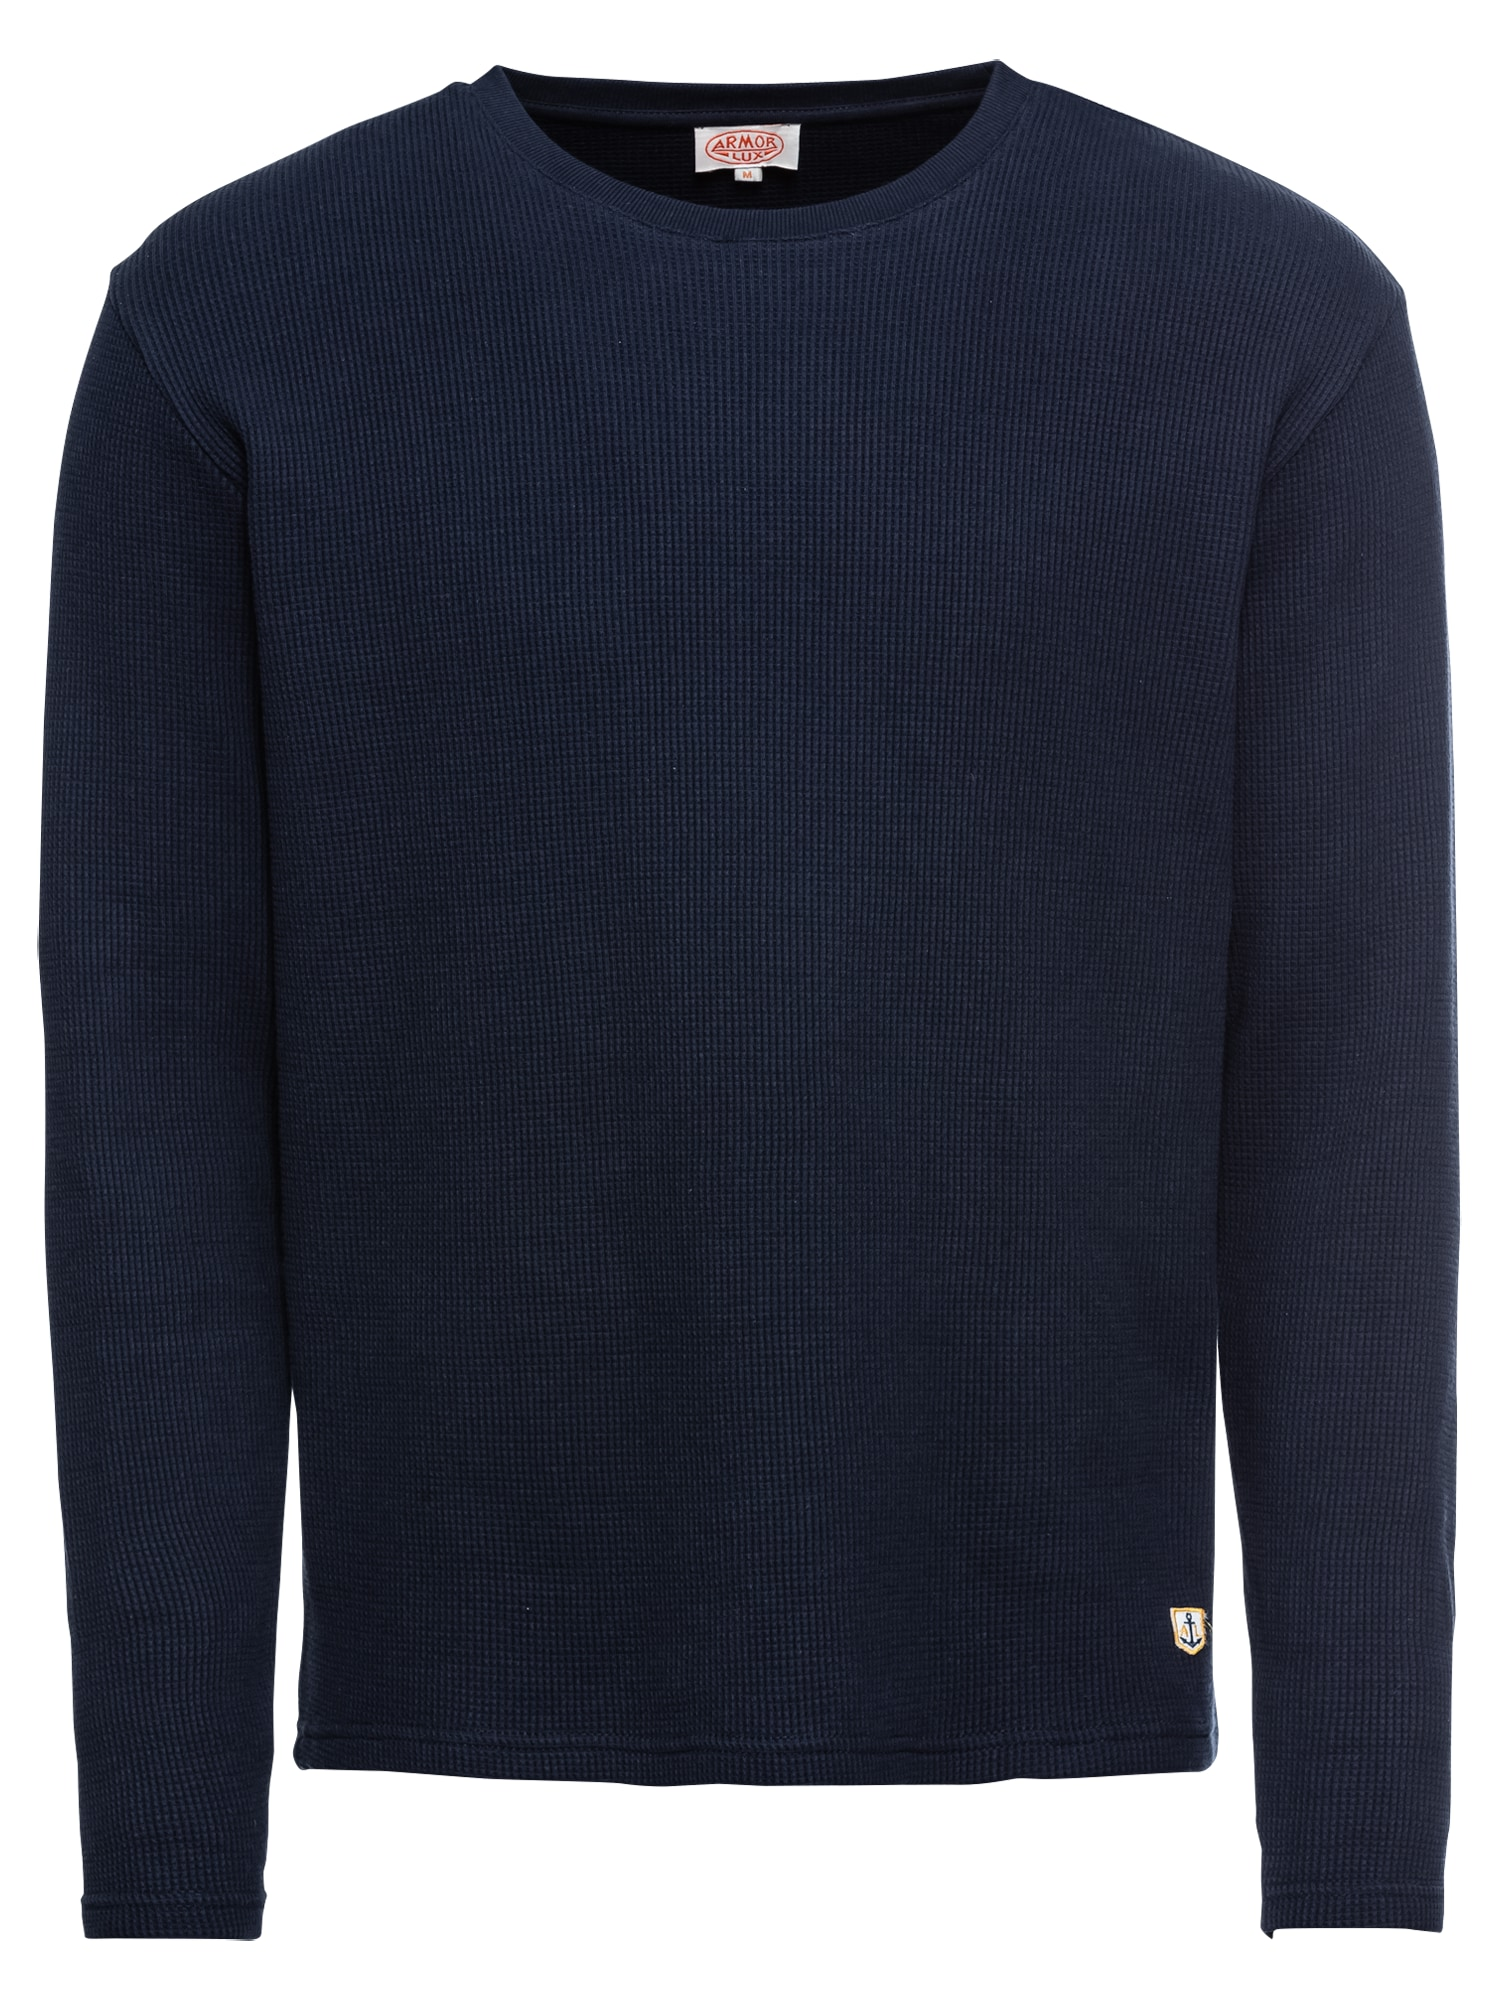 Svetr T-Shirt ML Héritage námořnická modř Armor Lux